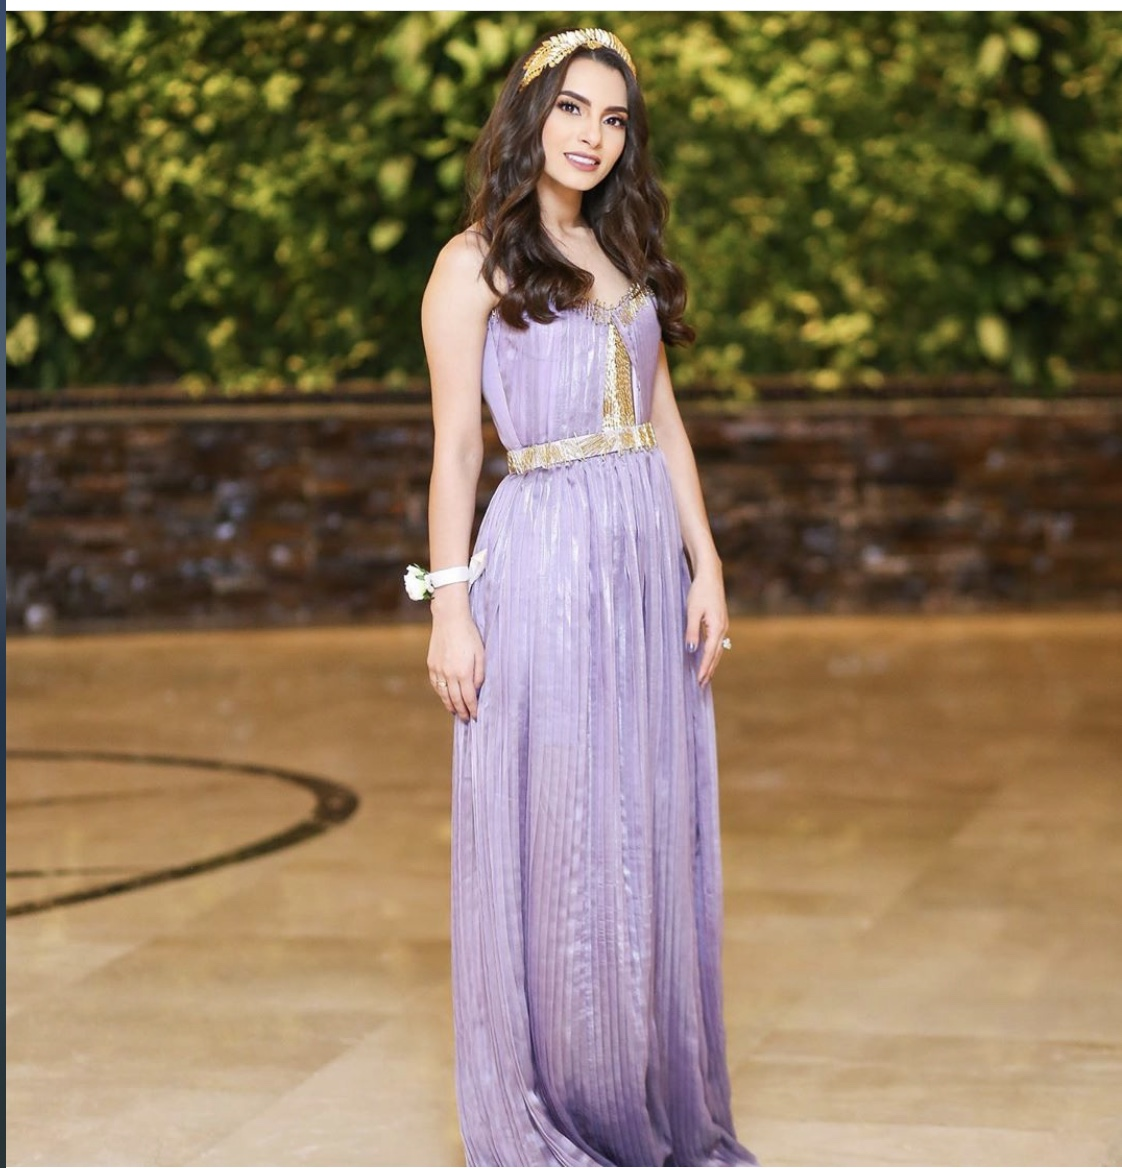 كارمن سليمان في فستان باللون البنفسجي